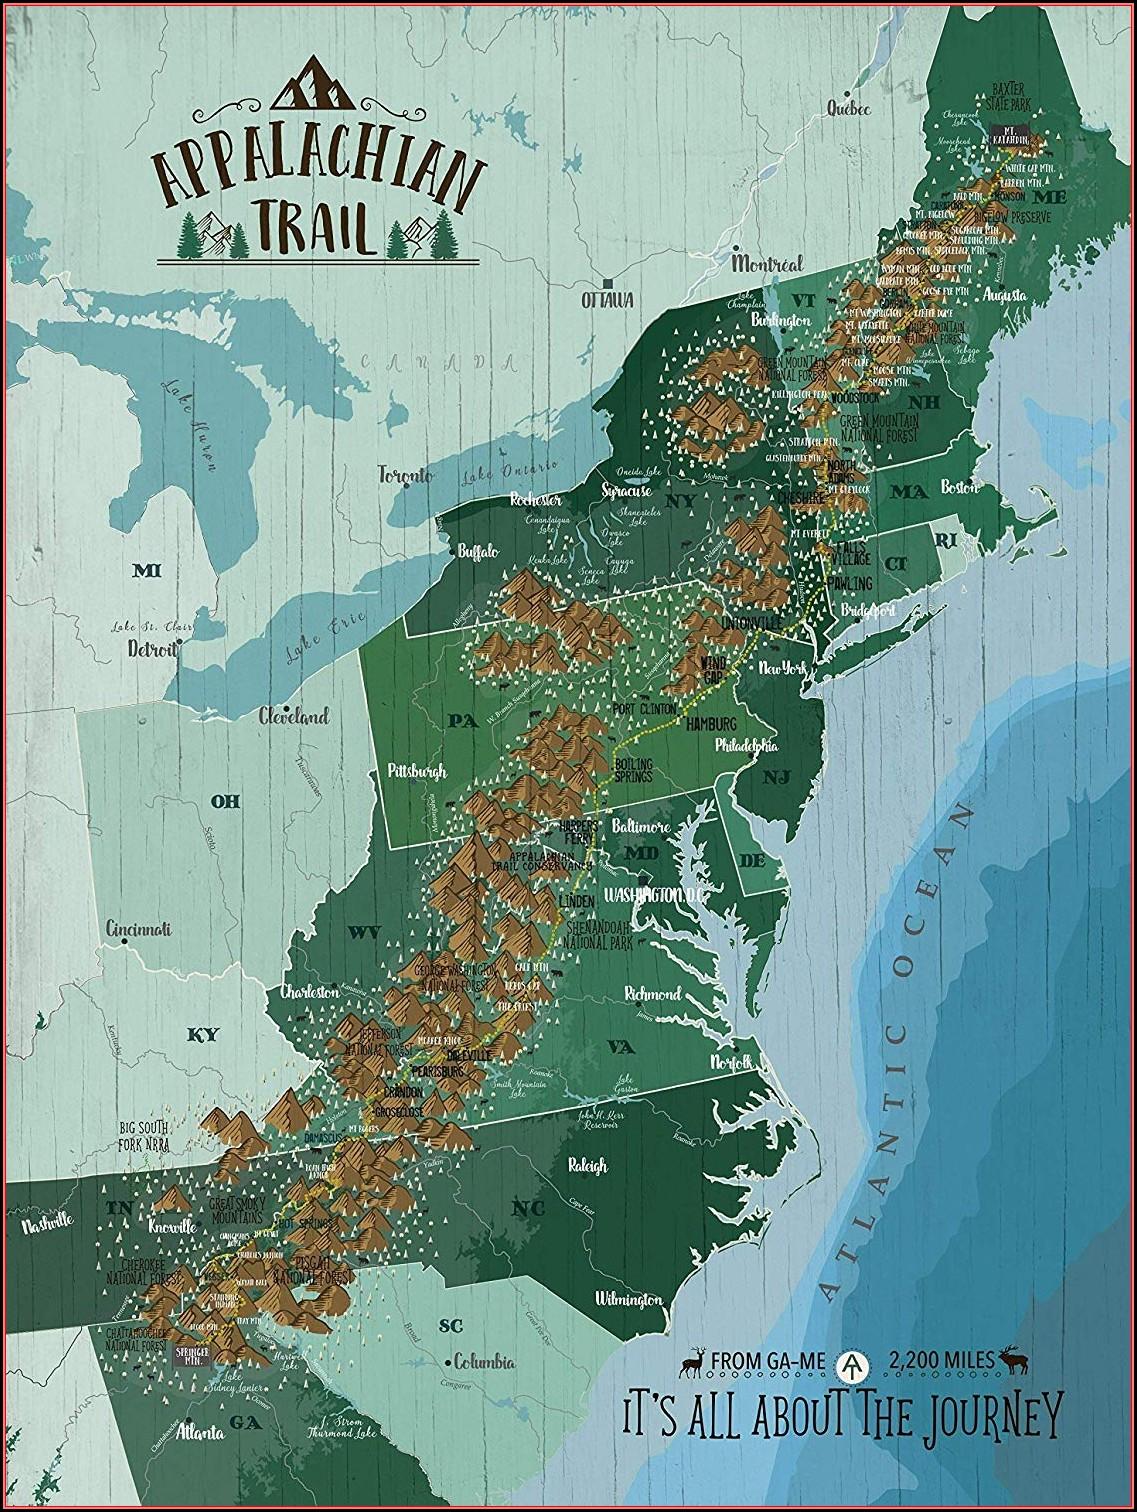 Appalachian Trail Poster Map